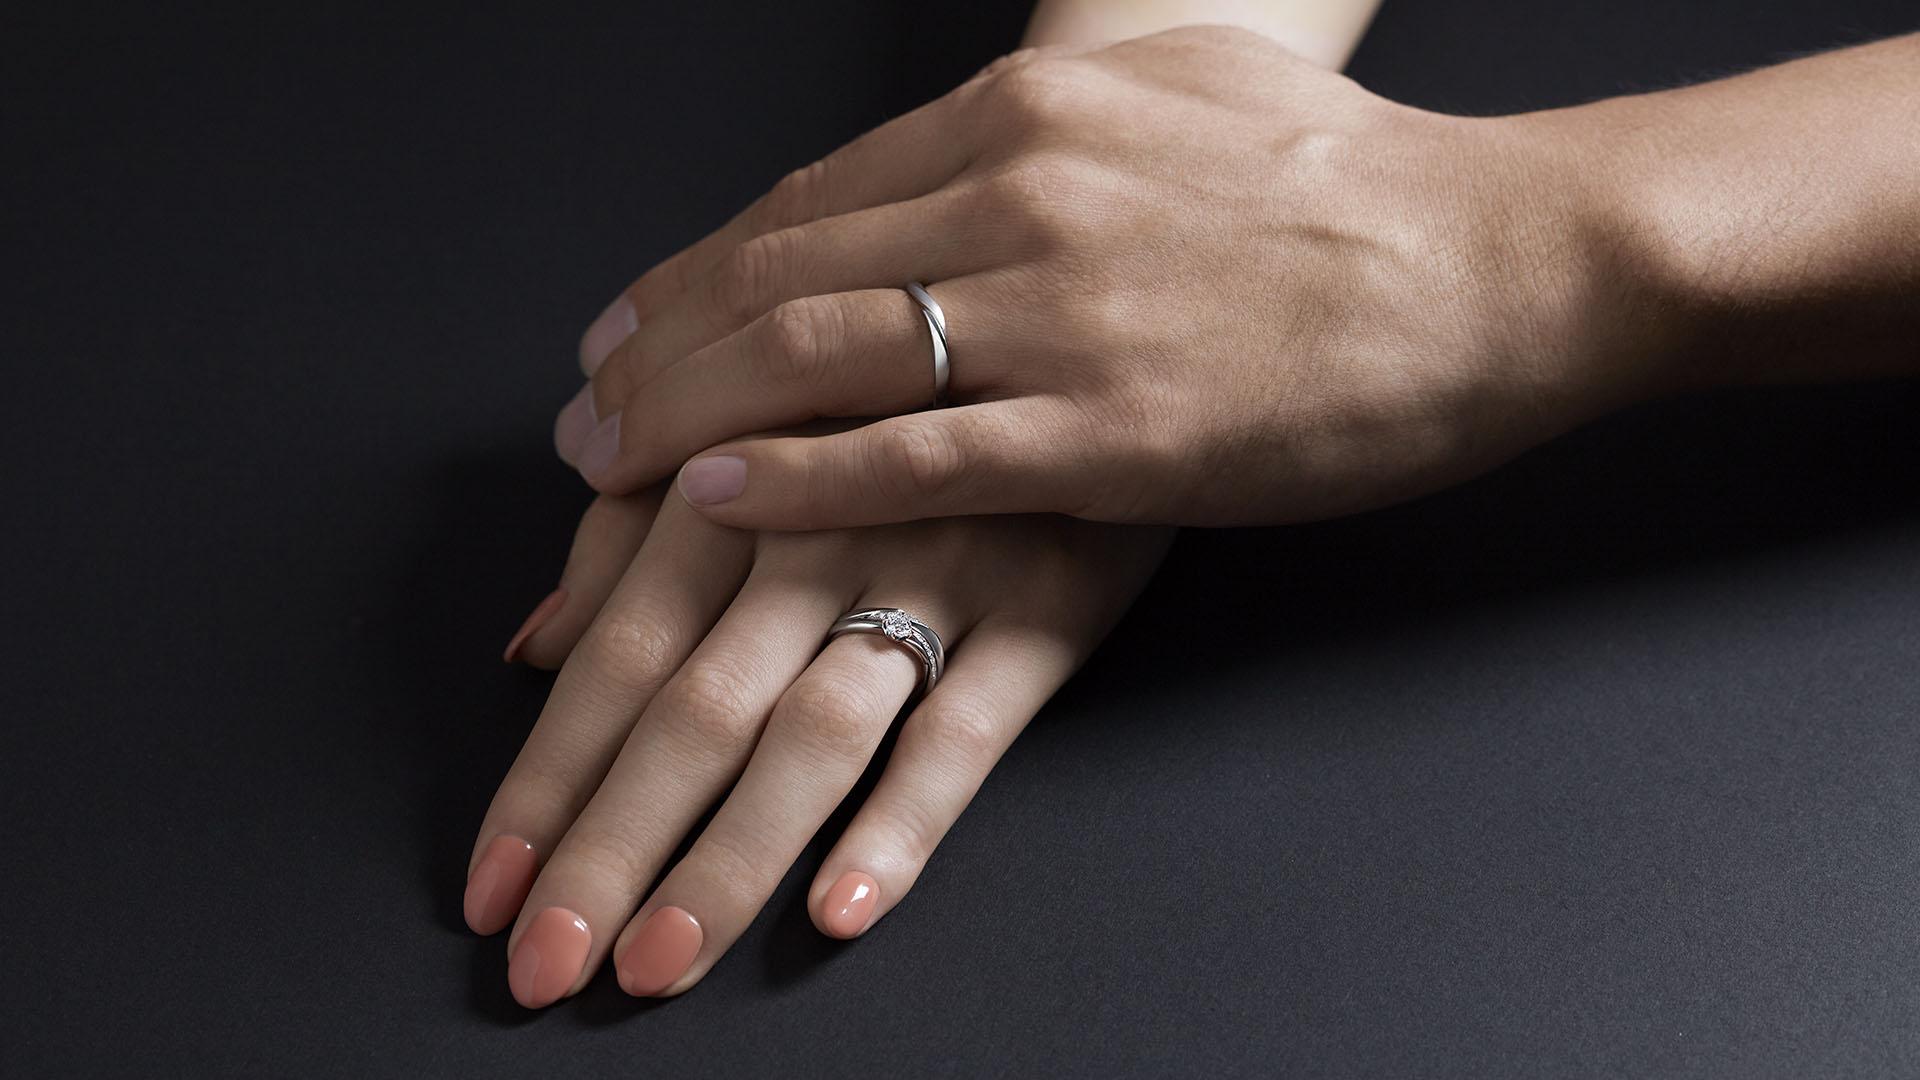 nocturnal ノクターナル | 結婚指輪サムネイル 3